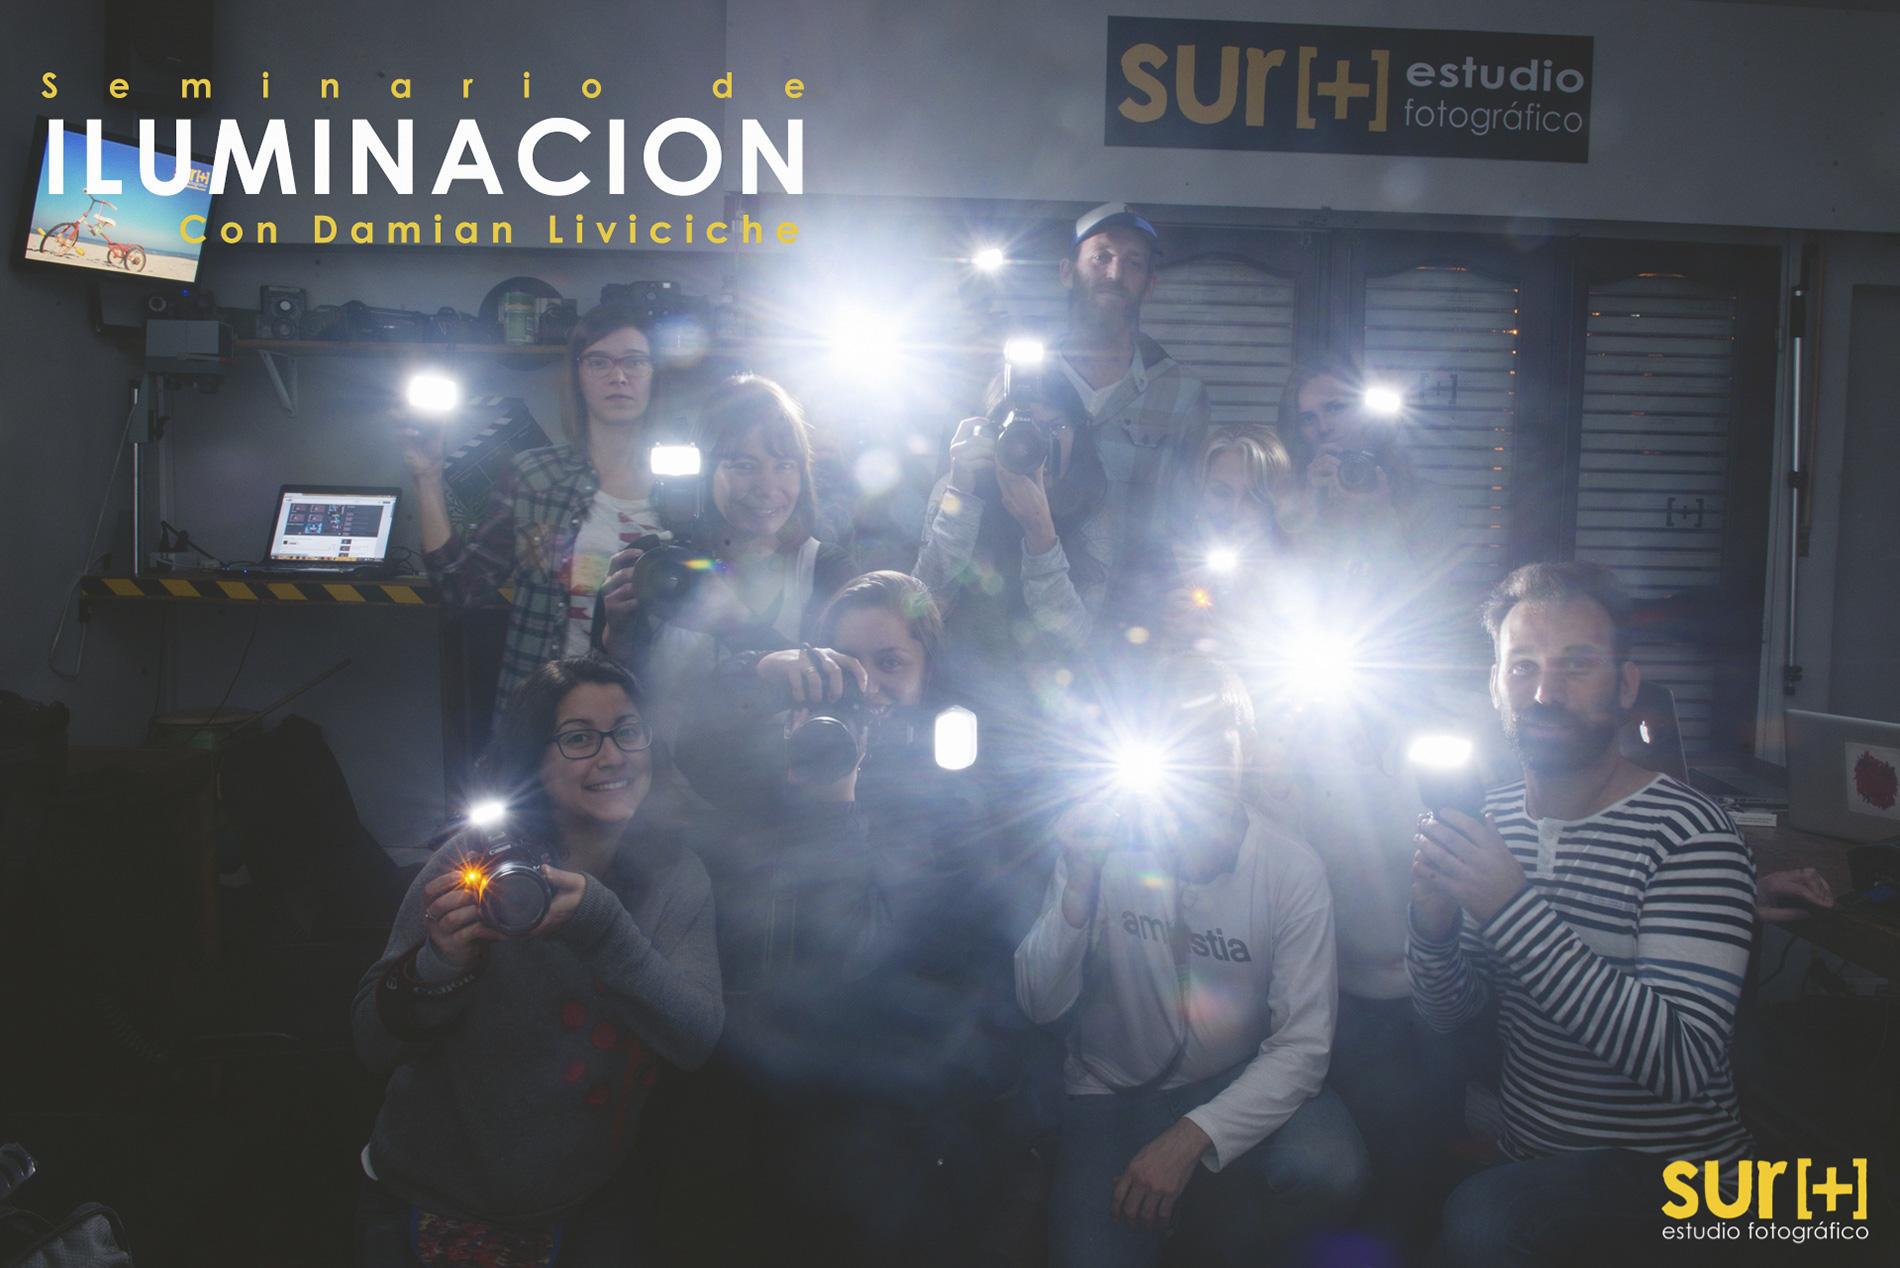 seminario de iluminacion-0